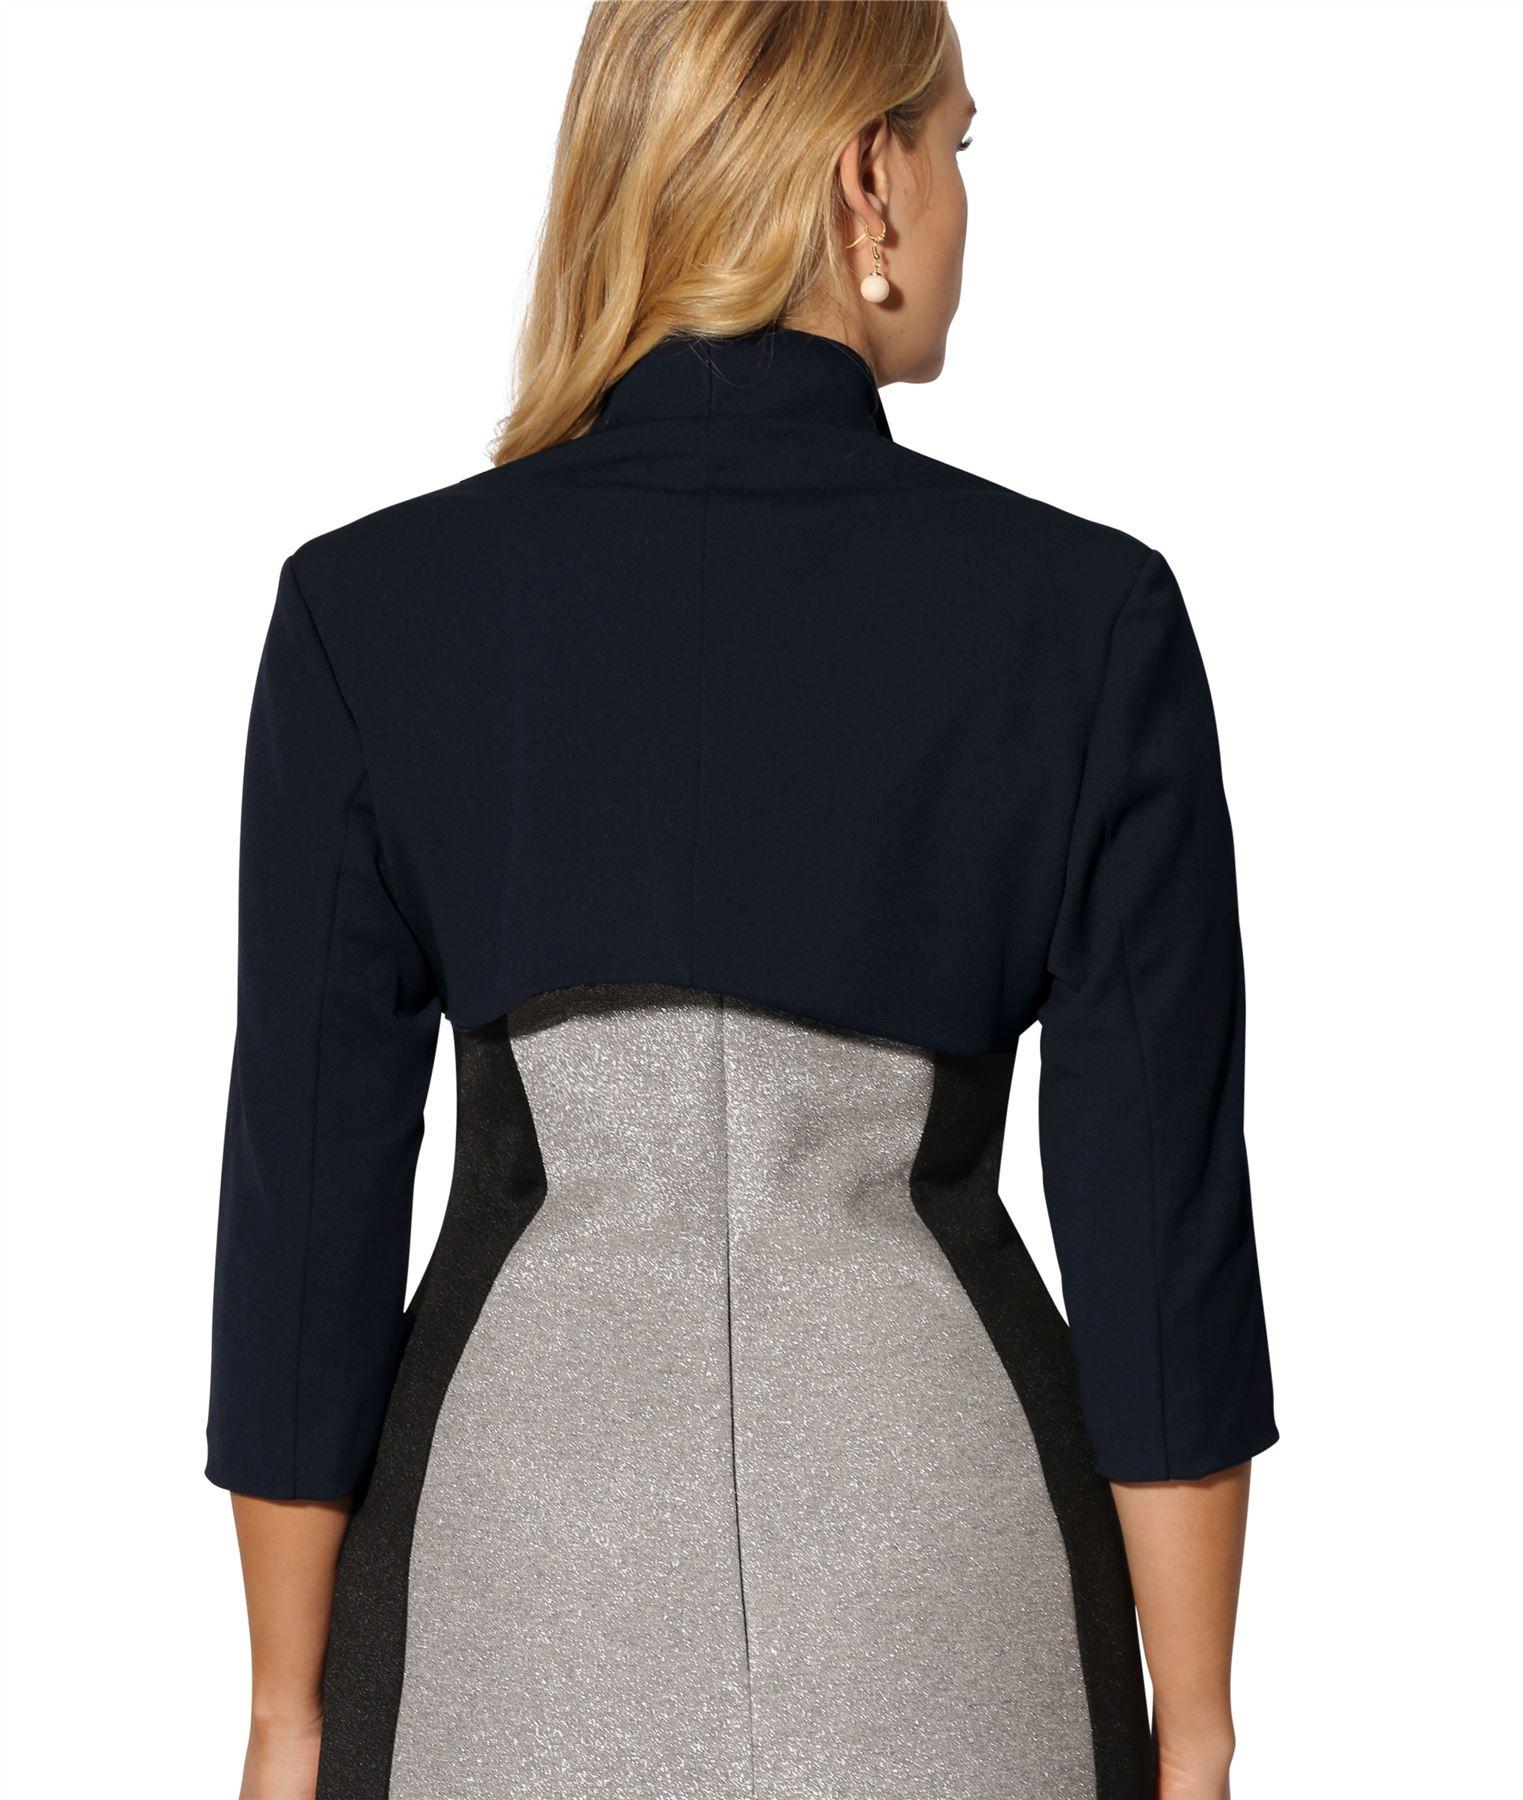 Womens-Tailored-Bolero-Shrug-Cropped-Top-Short-Sleeve-Party-Blazer-Jacket-Coat thumbnail 7